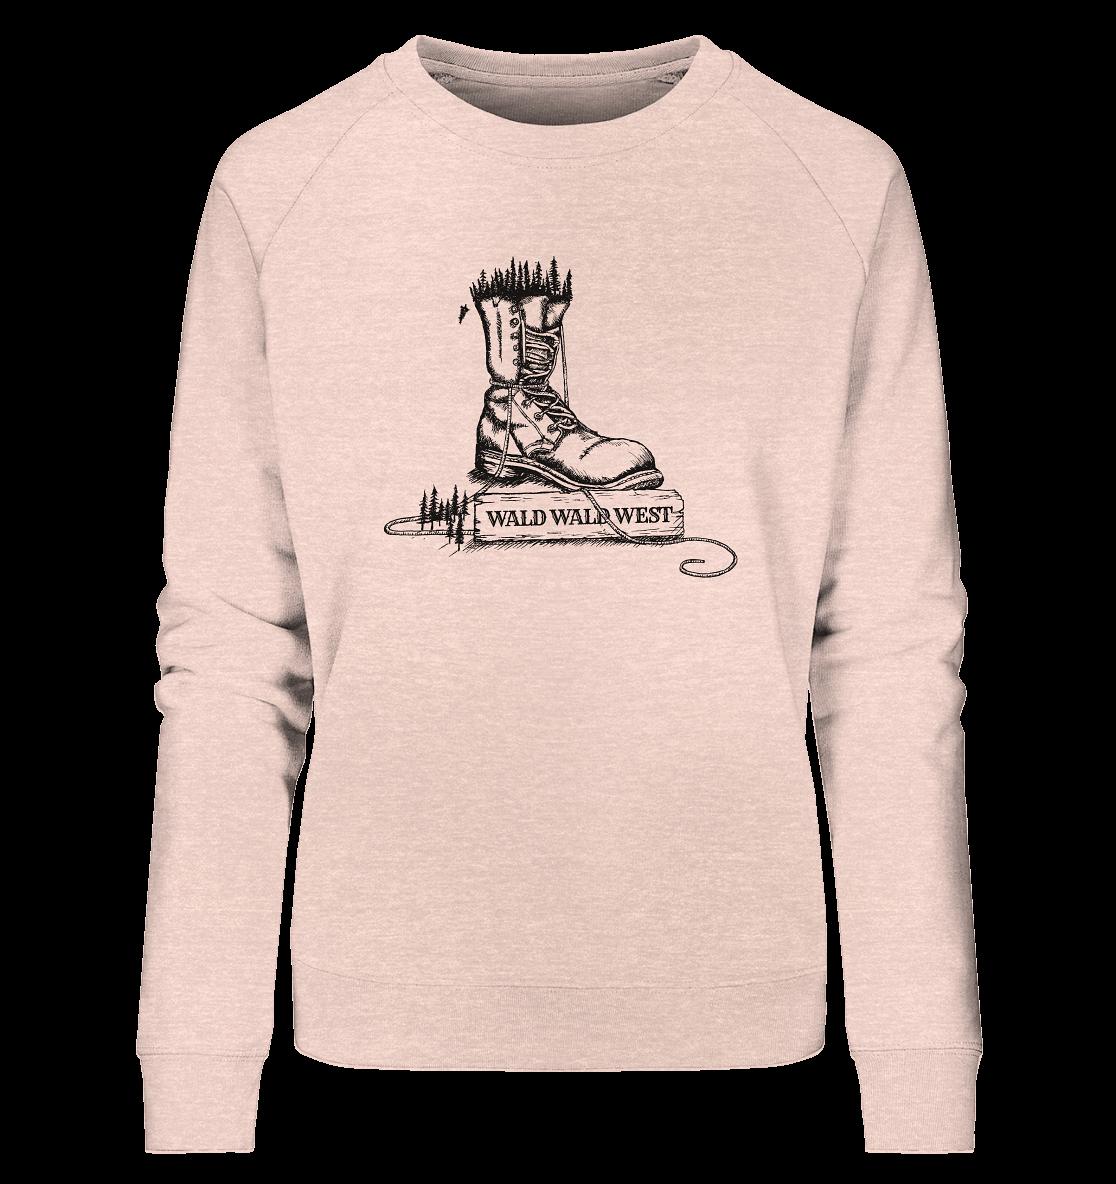 front-ladies-organic-sweatshirt-ffded6-1116x-1.png